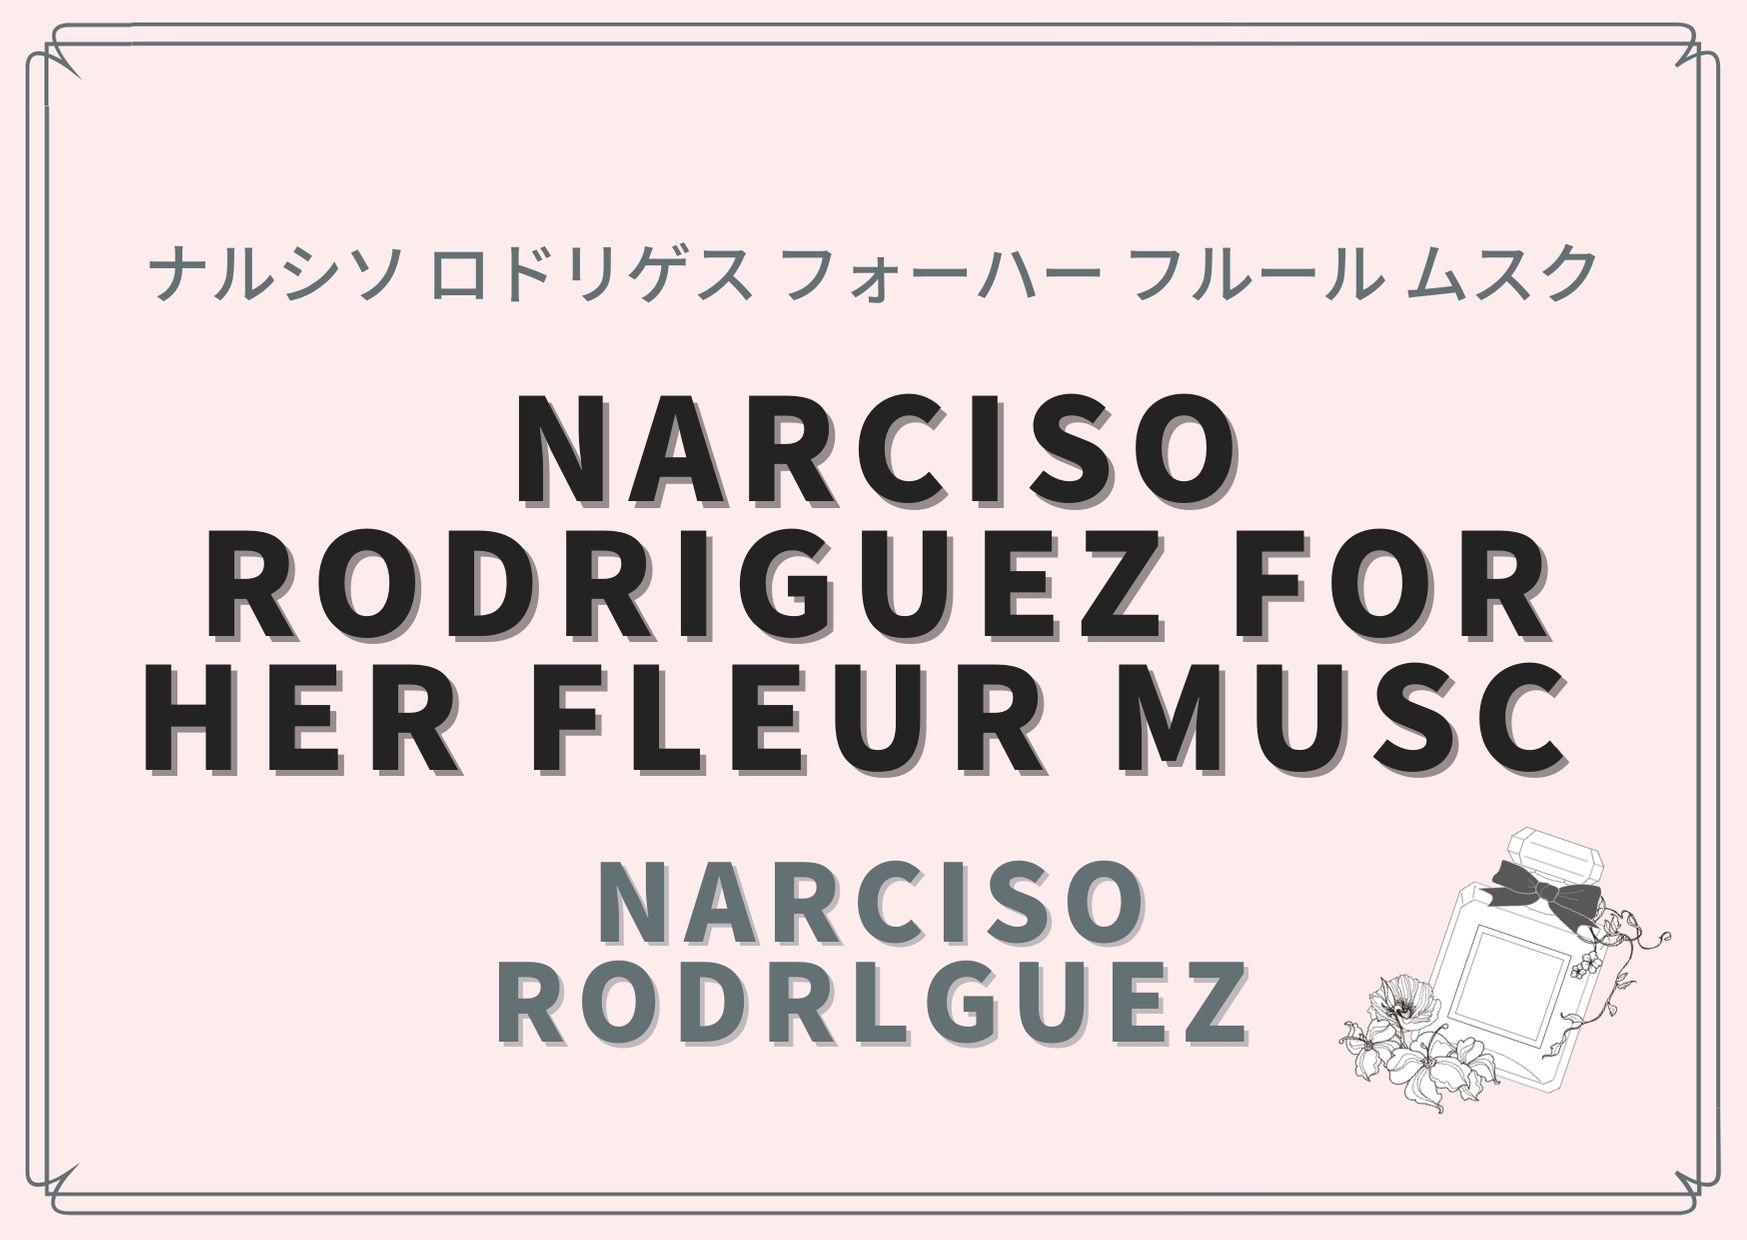 NARCISO RODRIGUEZ FOR HER FLEUR MUSC (ナルシソ ロドリゲス フォーハー フルール ムスク)/ Narciso Rodrlguez(ナルシソ ロドリゲス)